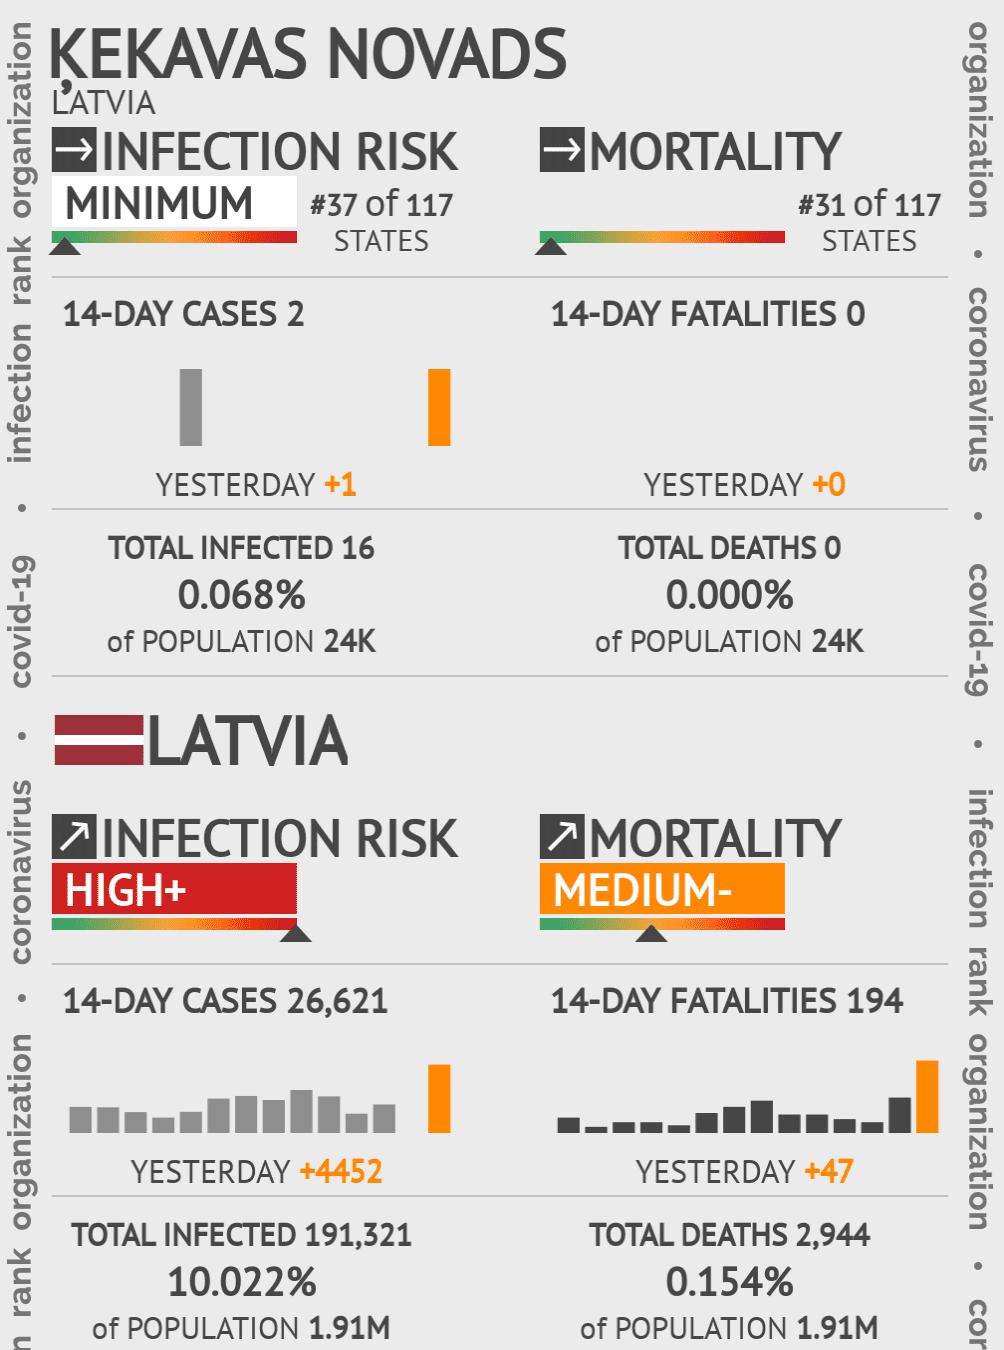 Ķekavas novads Coronavirus Covid-19 Risk of Infection on May 14, 2020